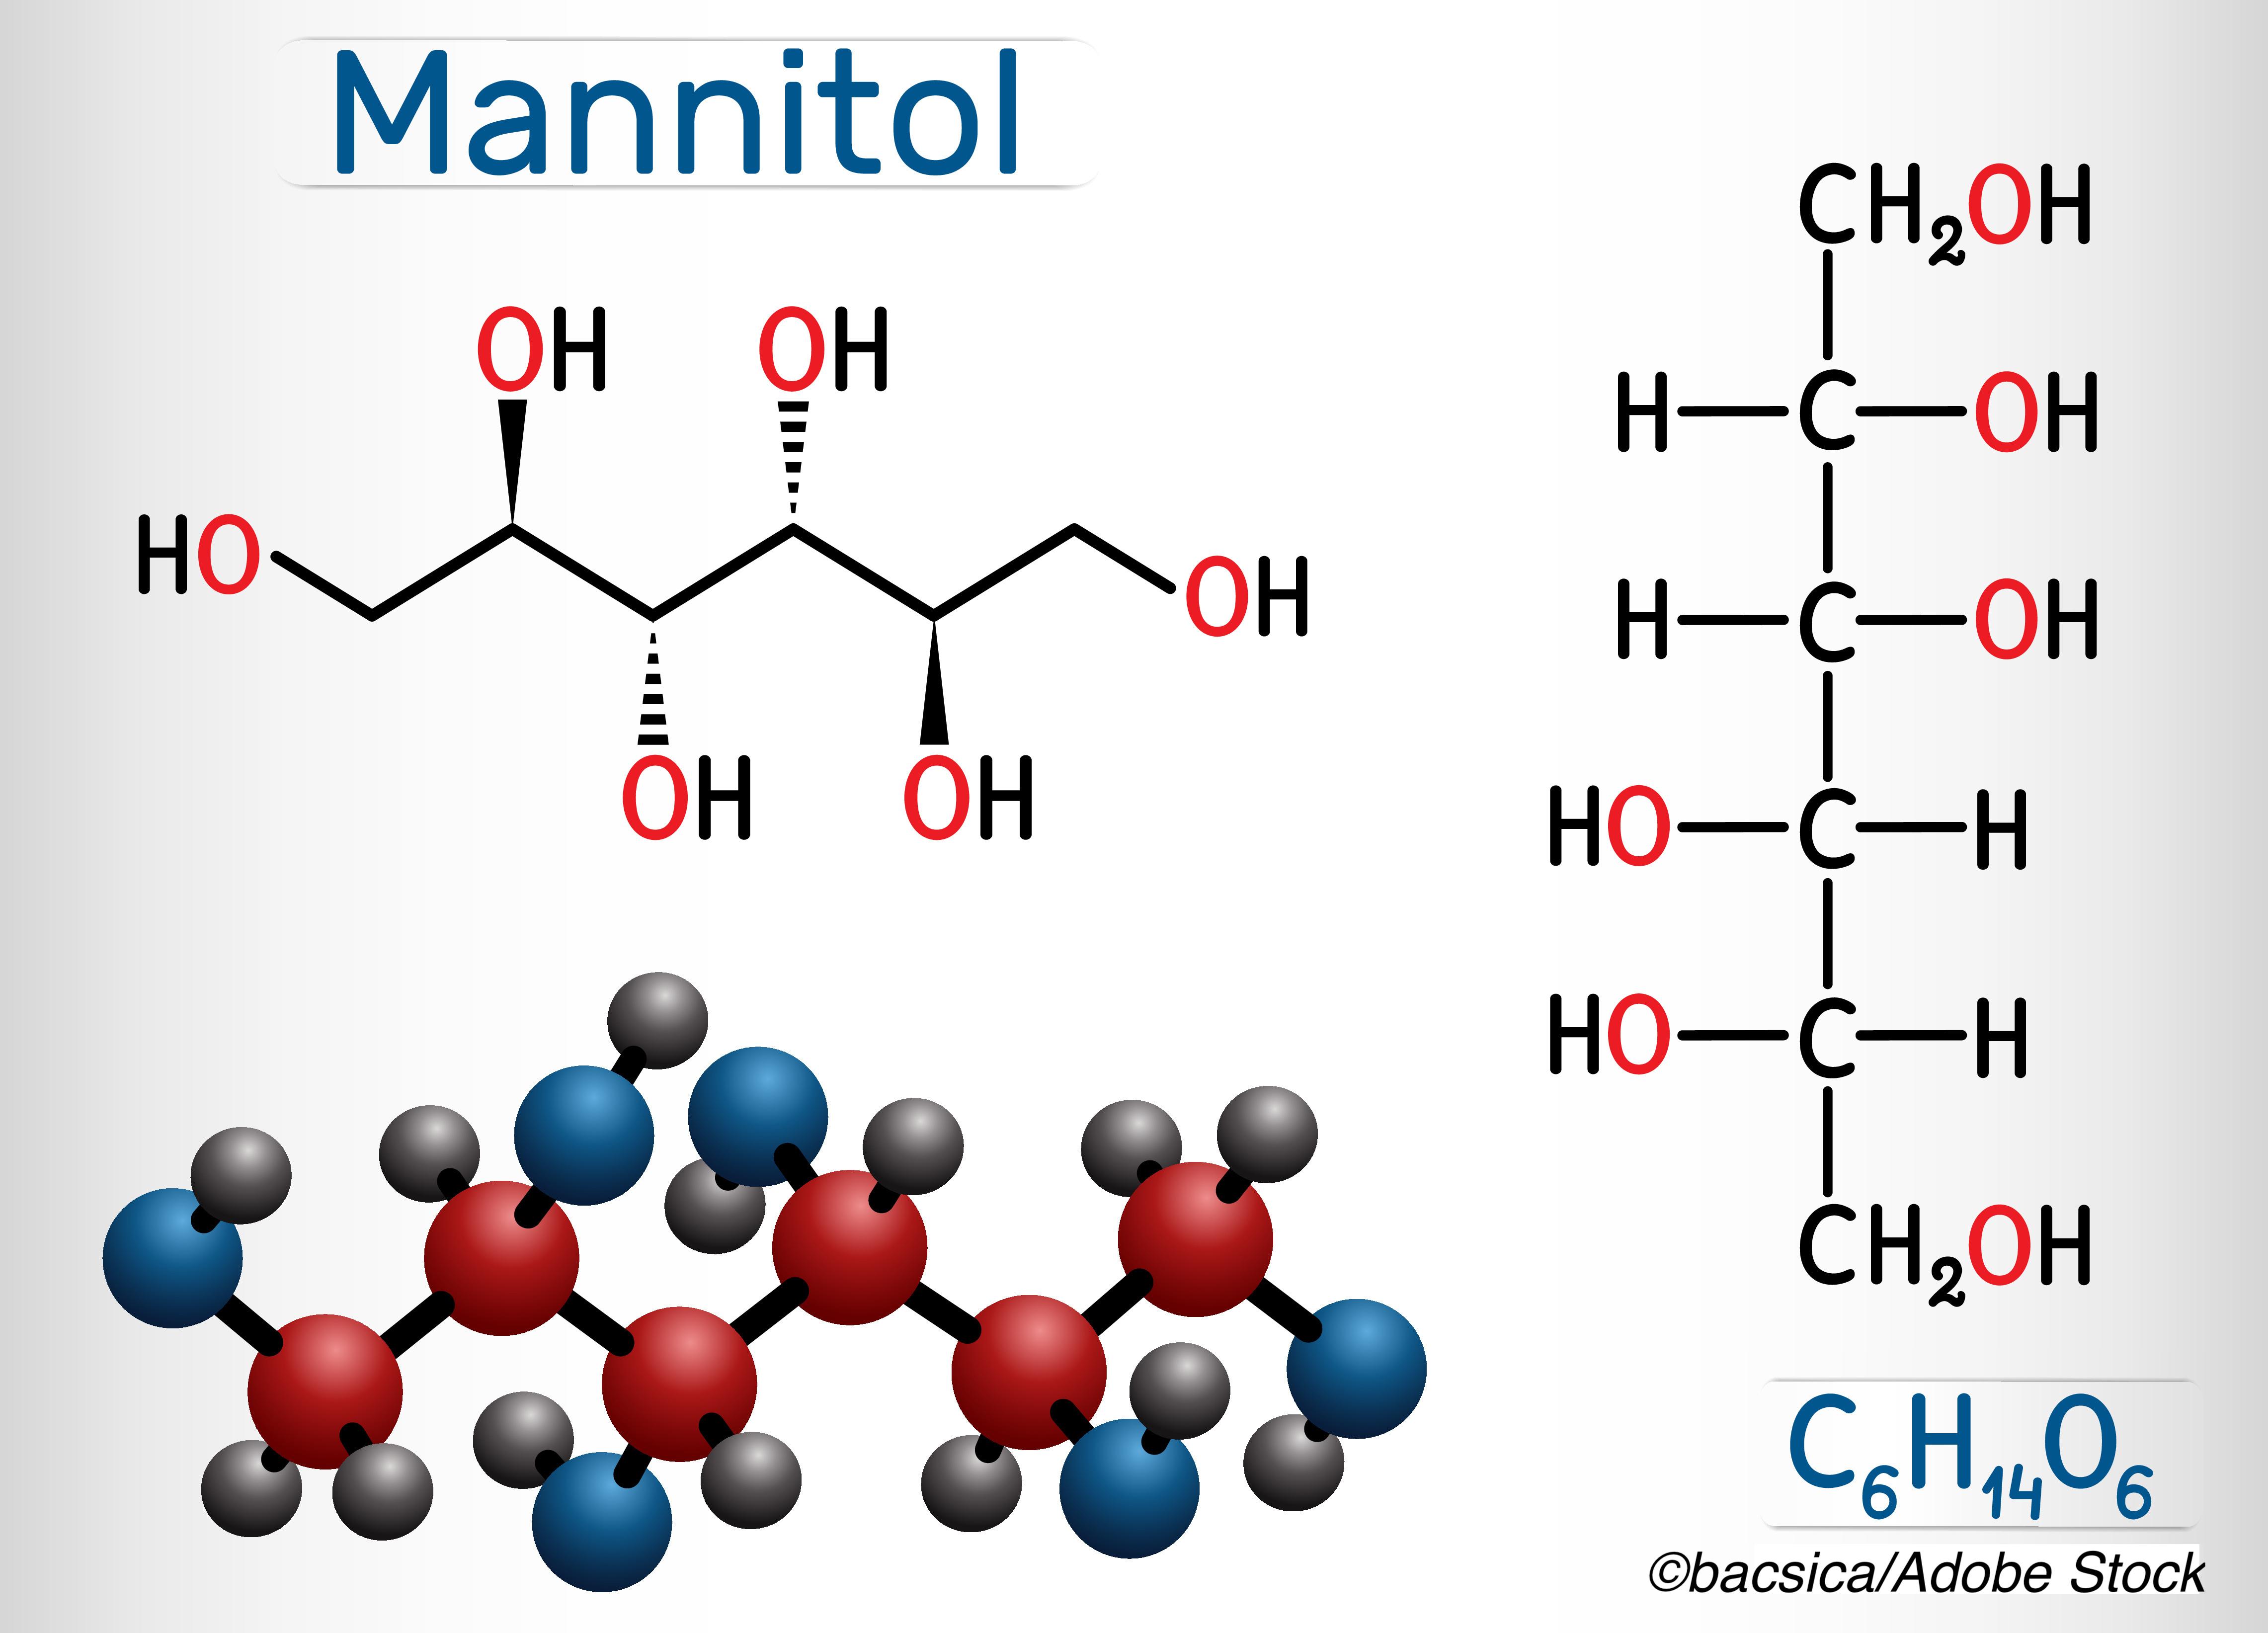 FDA OKs Mannitol as Add-On Maintenance for CF